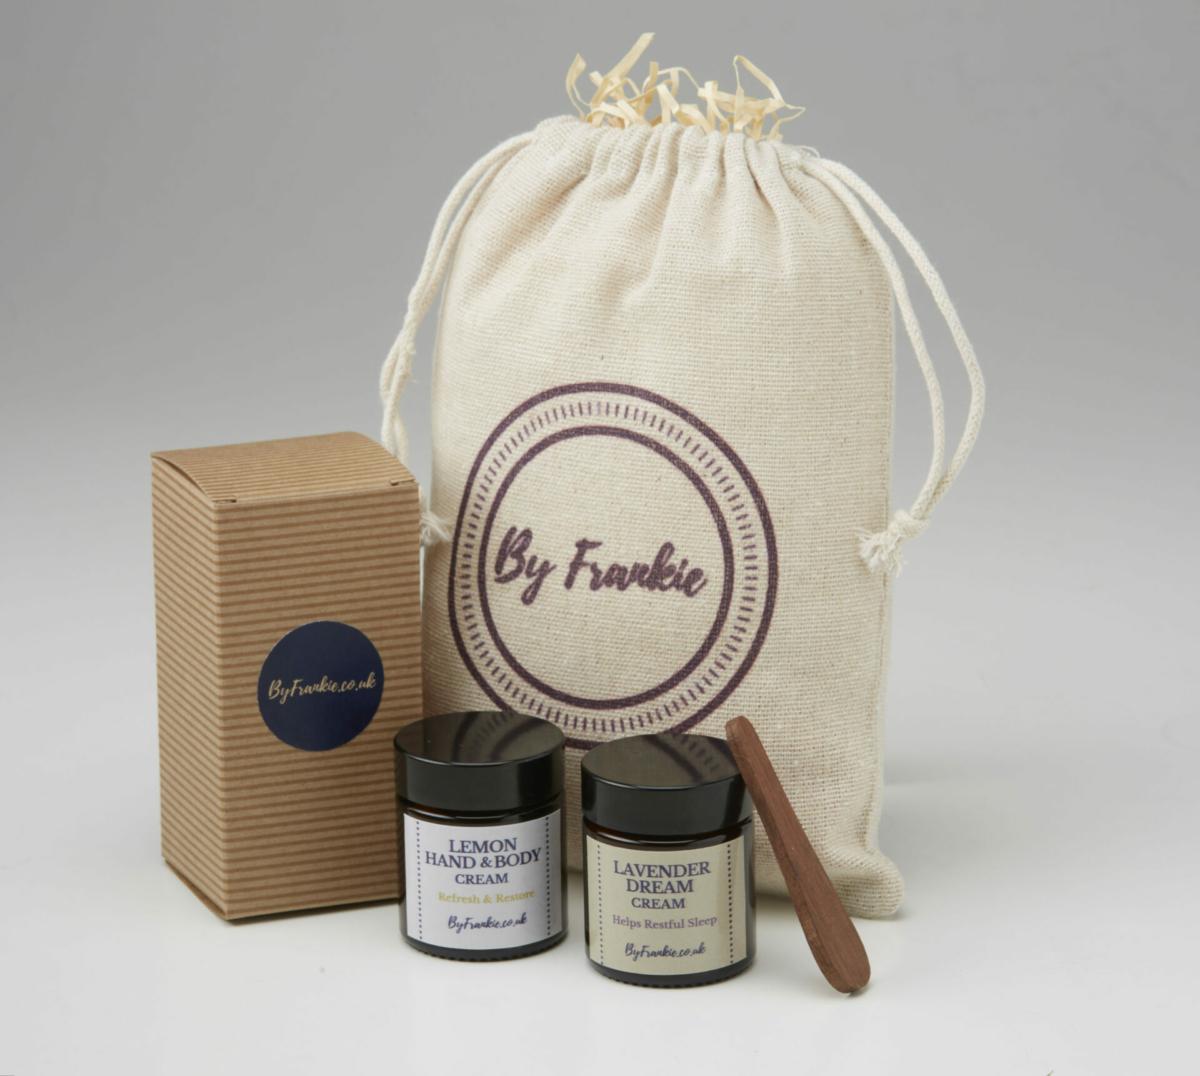 Lemon hand cream and Lavender body cream gift set at Henley Circle Online Shop